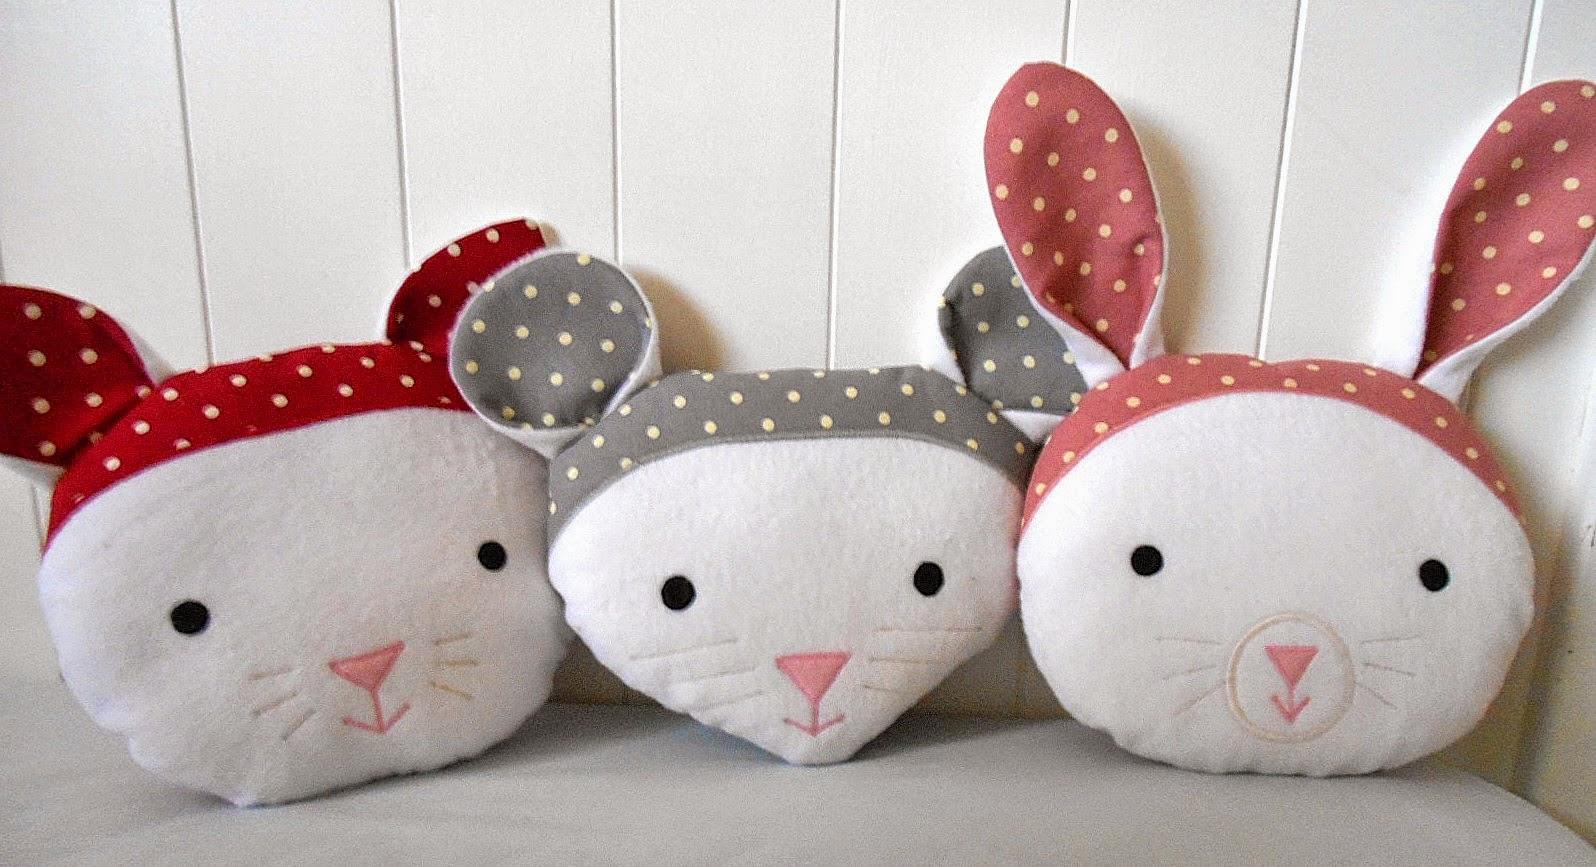 Animal Nursery Pillows : handmade by eva rose: Sweet Animal Faces Pillows for Nursery